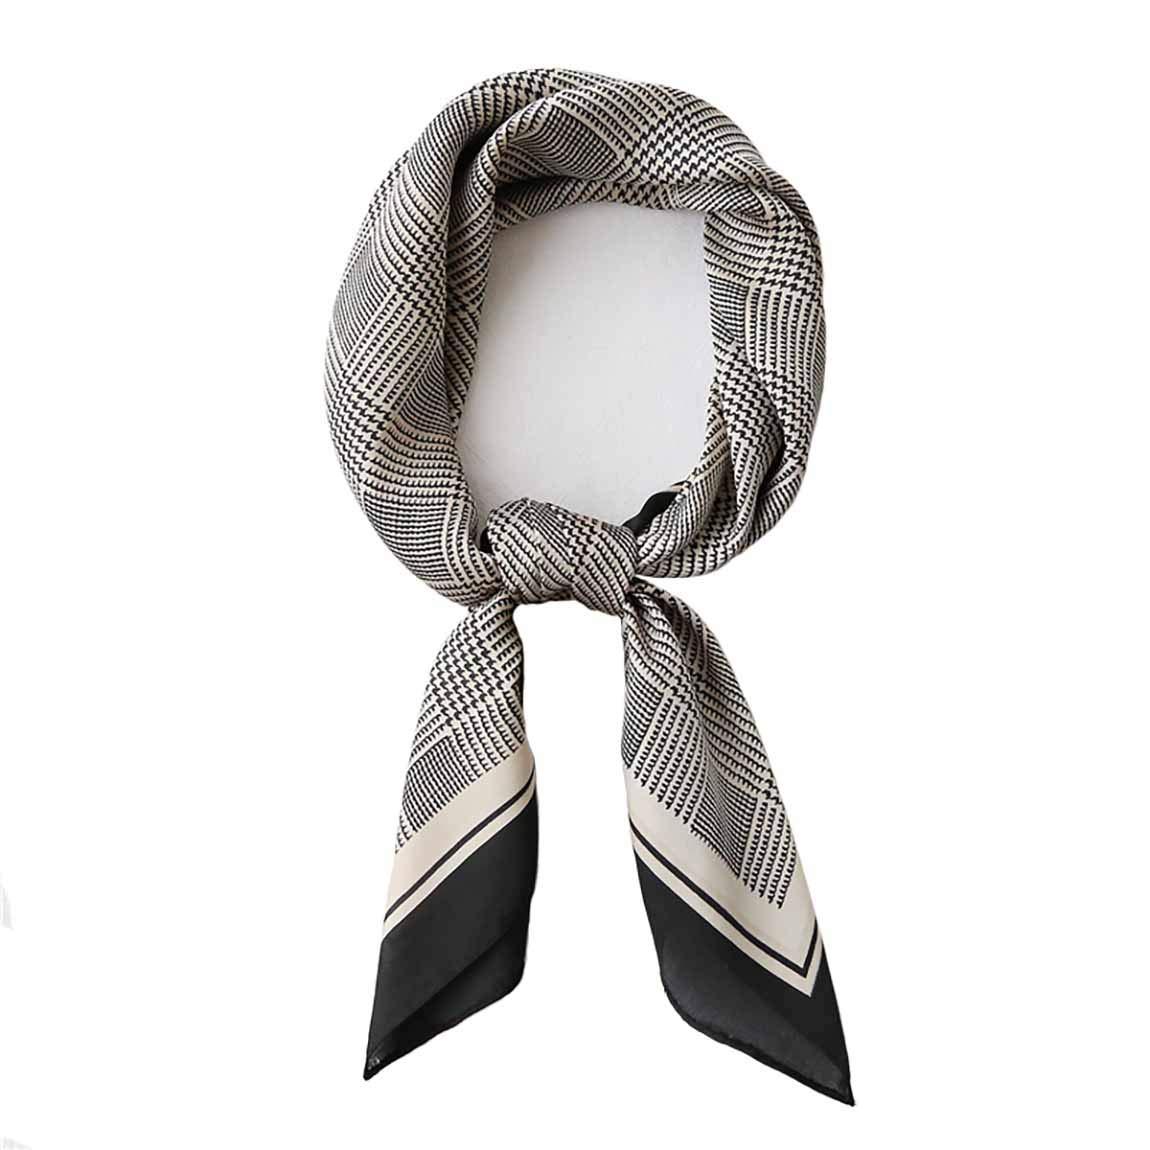 7db529e486a85 Silk Scarf Square Satin Headscarf Women's Fashion Scarfs Neckerchief Neck  Tie (190#) at Amazon Women's Clothing store: